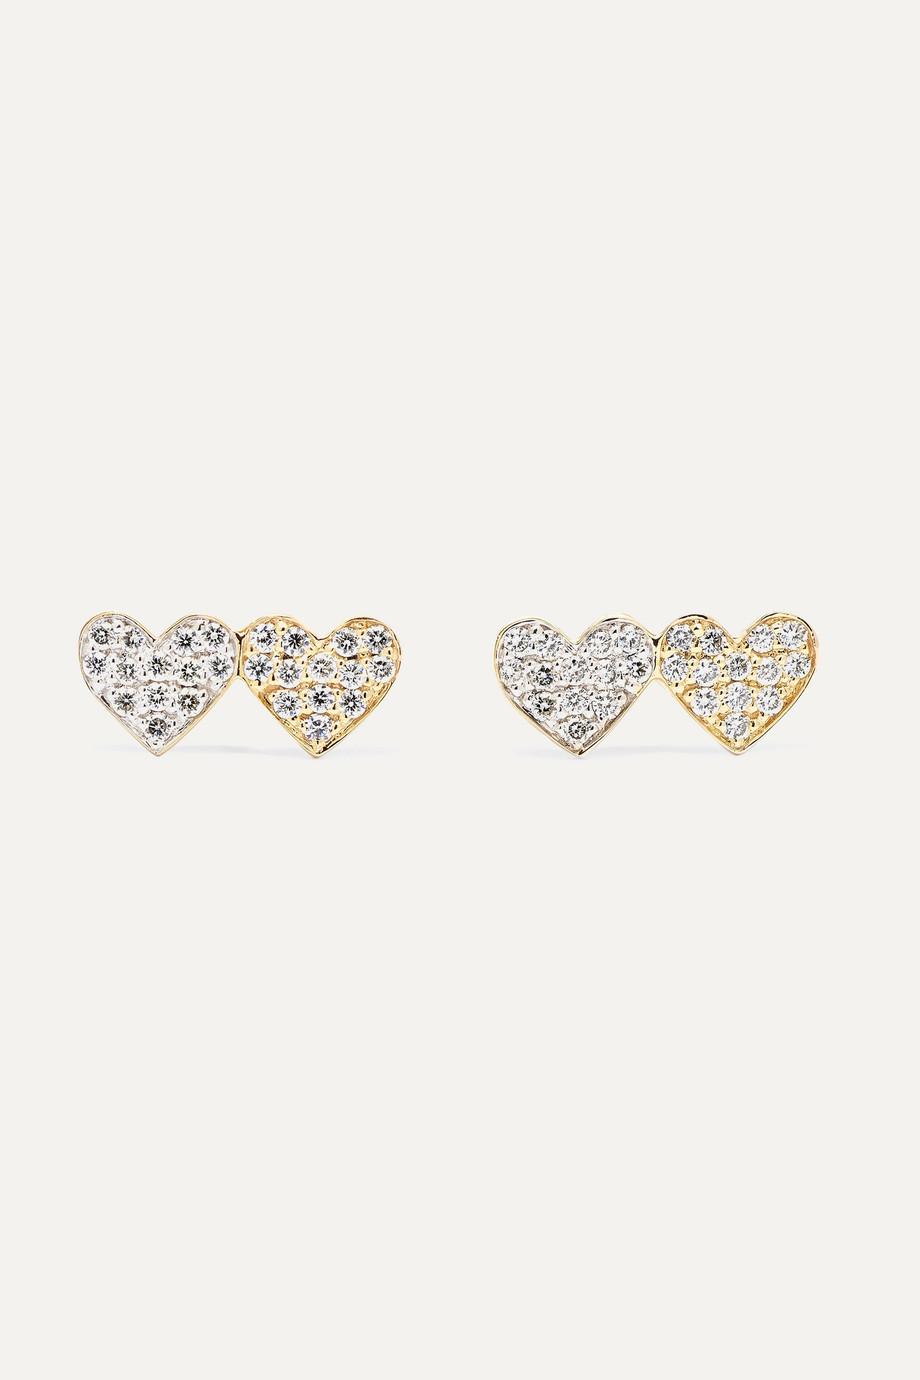 Sydney Evan Double Hearts 14-karat gold diamond earrings